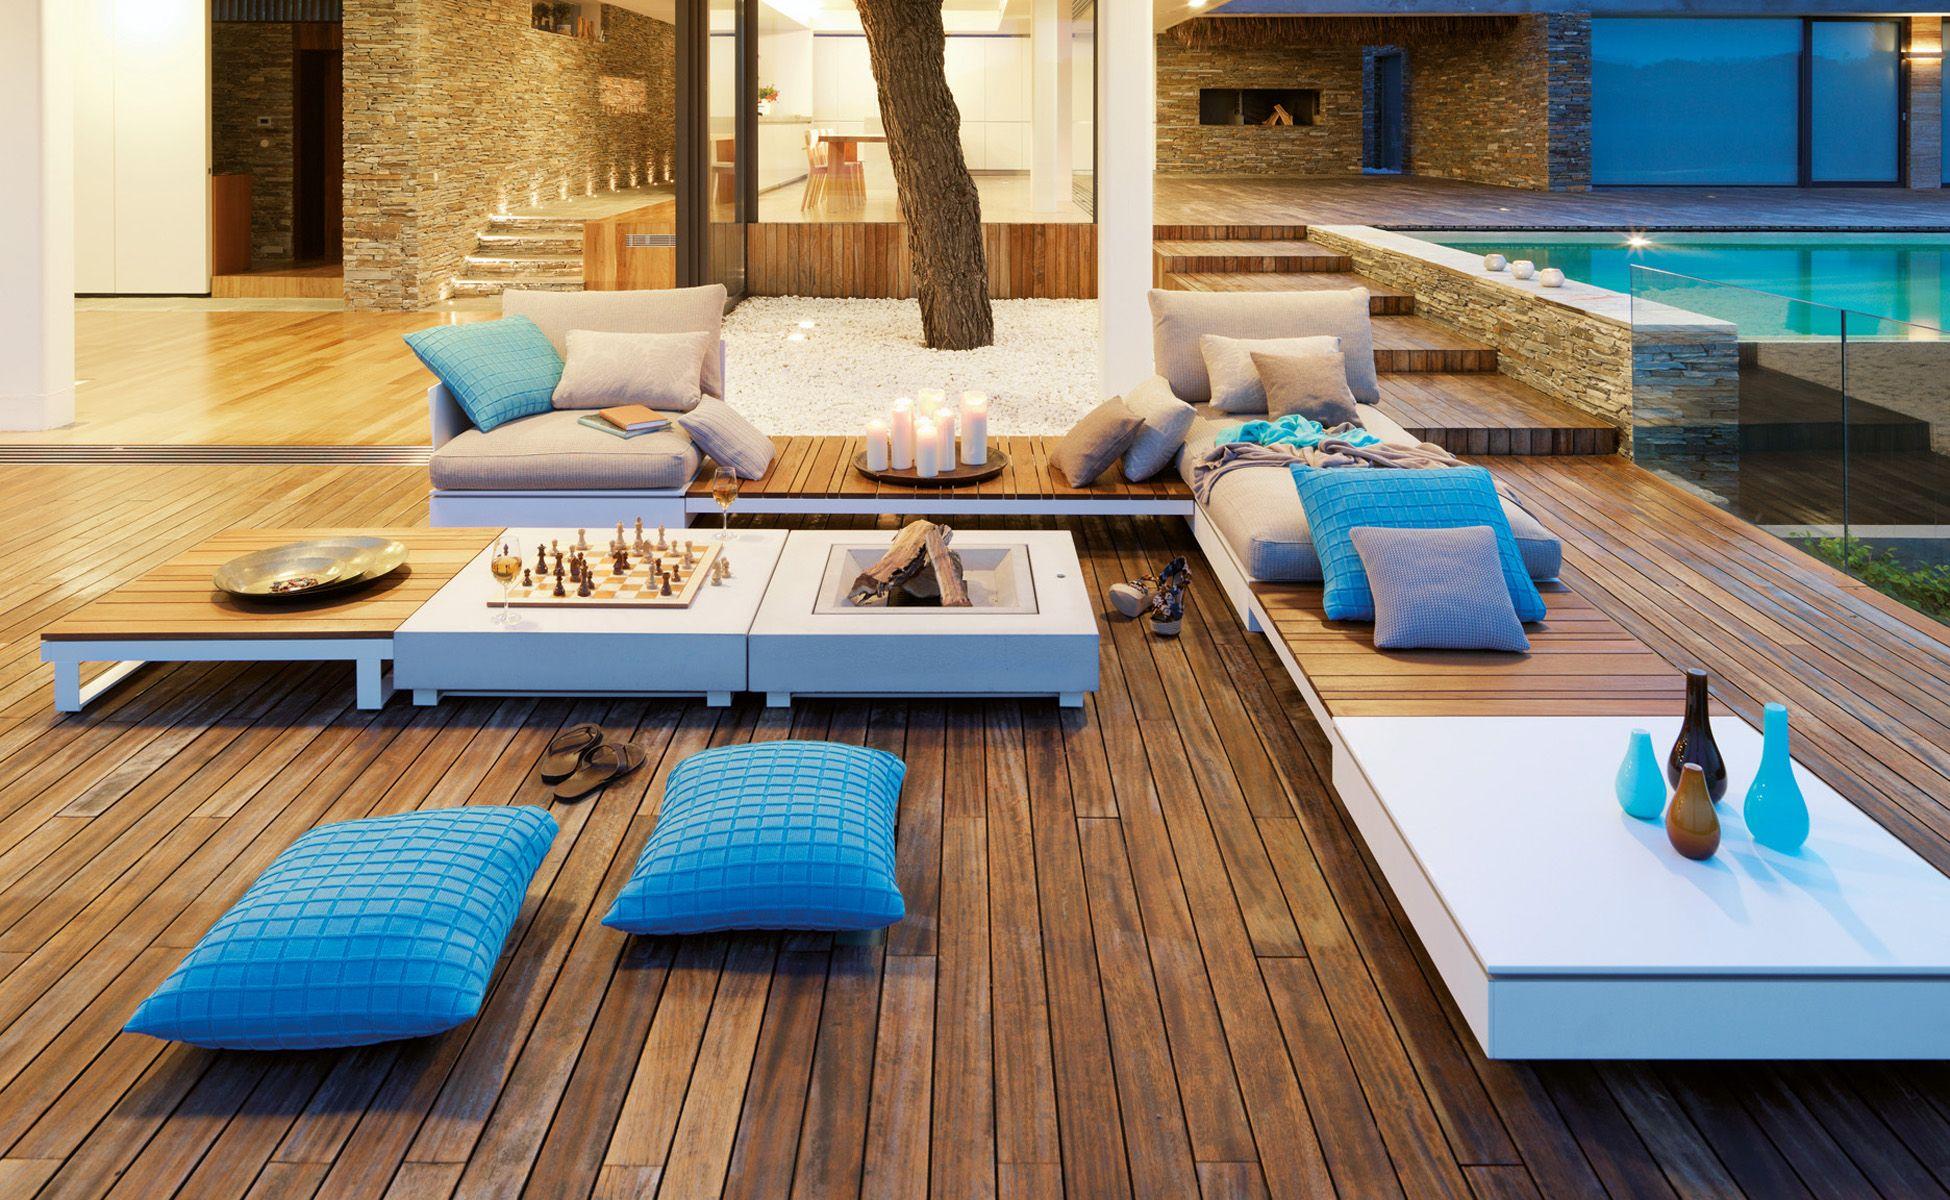 Möbelabholung Berlin viteo lounge outdoor möbel bei steidten berlin terrasse